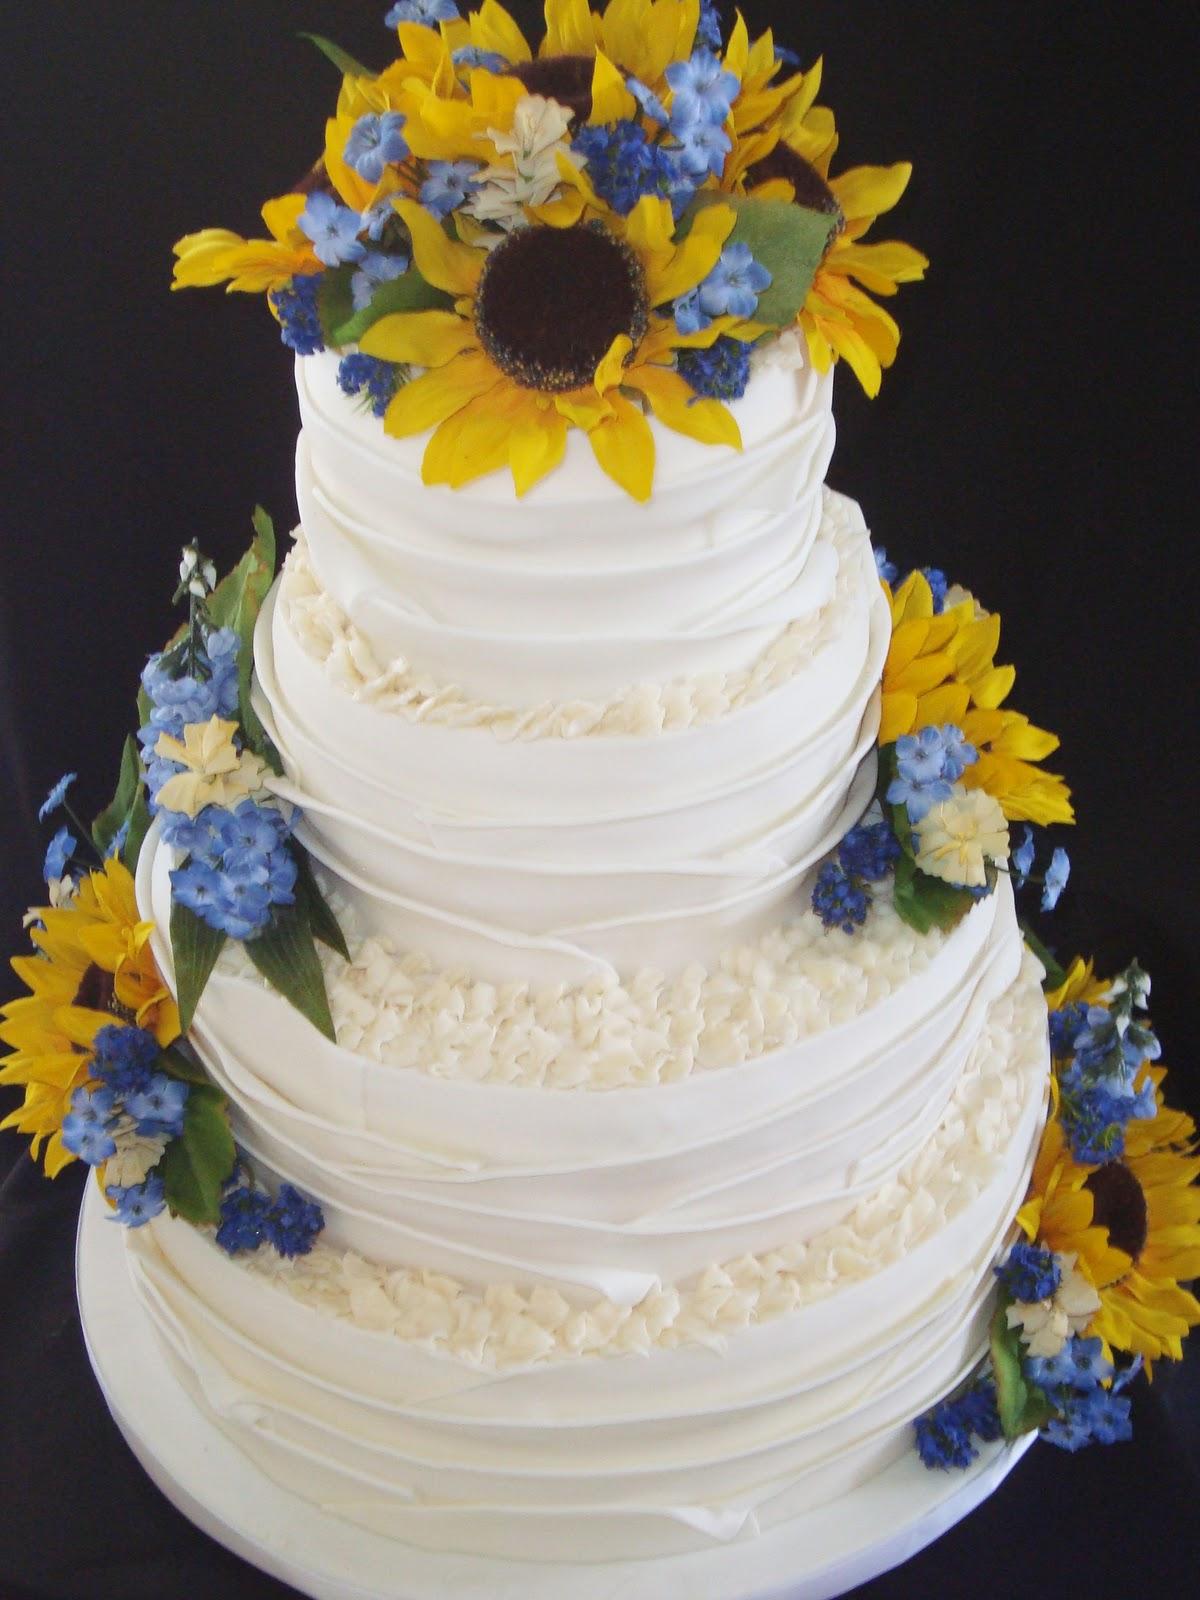 12 Huge Rustic Sunflower Wedding Cakes Photo - Rustic Wedding Cake ...